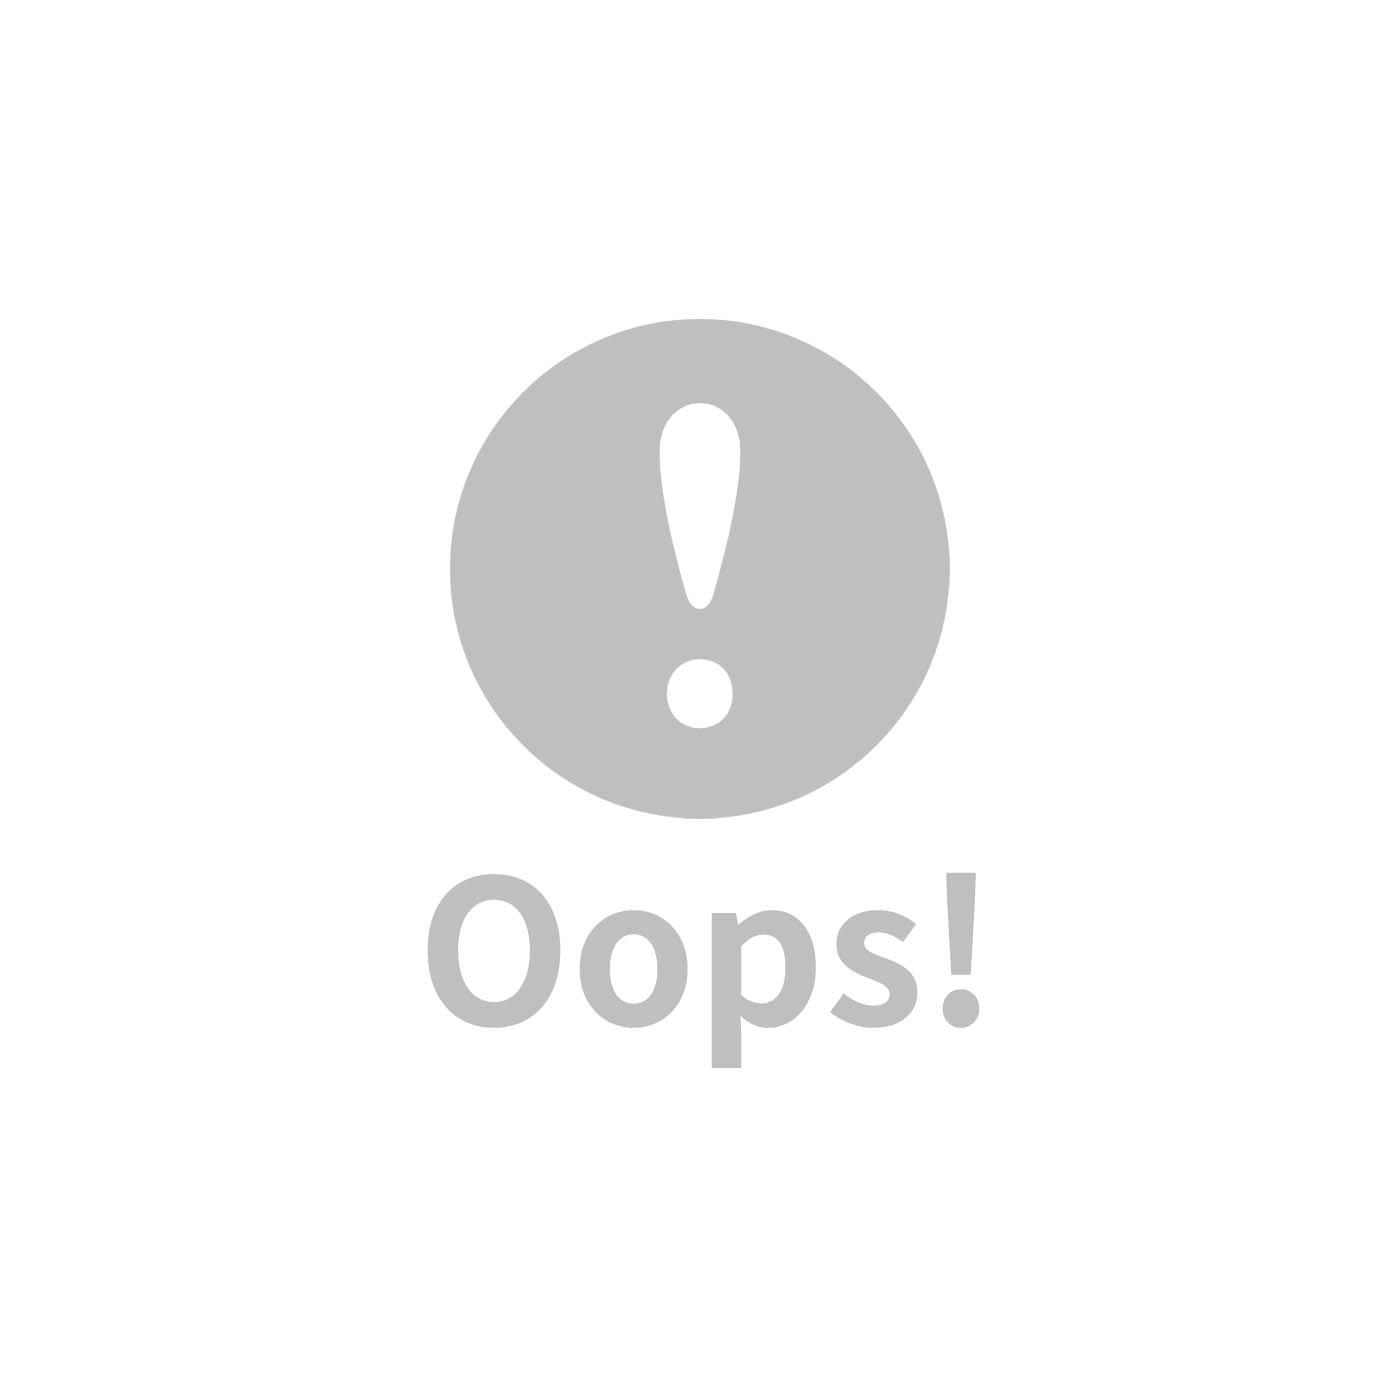 Pacific Baby 美國不鏽鋼保溫太空瓶7oz+4oz二入學習喝水組(貼心紅7oz+親切藍4oz+藍學習配件)